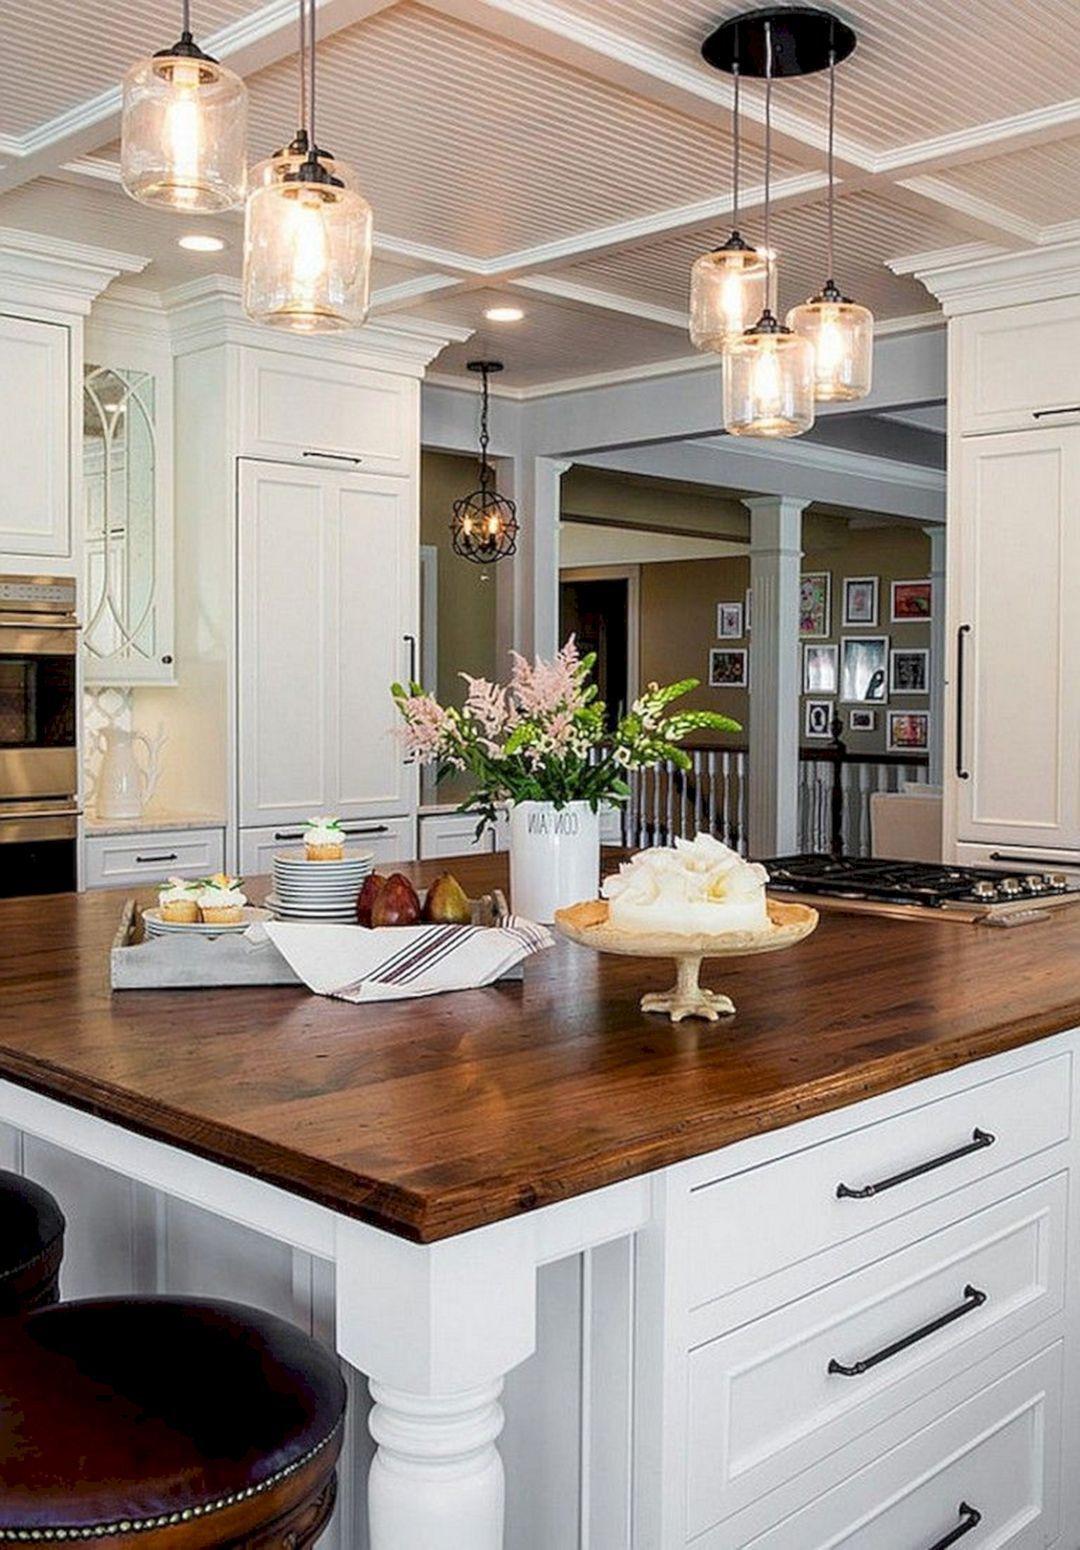 14 Beautiful Kitchen Lighting Design Ideas To Inspire You Kitchenlampideas Kitchenl In 2020 Best Kitchen Lighting Farmhouse Style Kitchen Farmhouse Kitchen Lighting